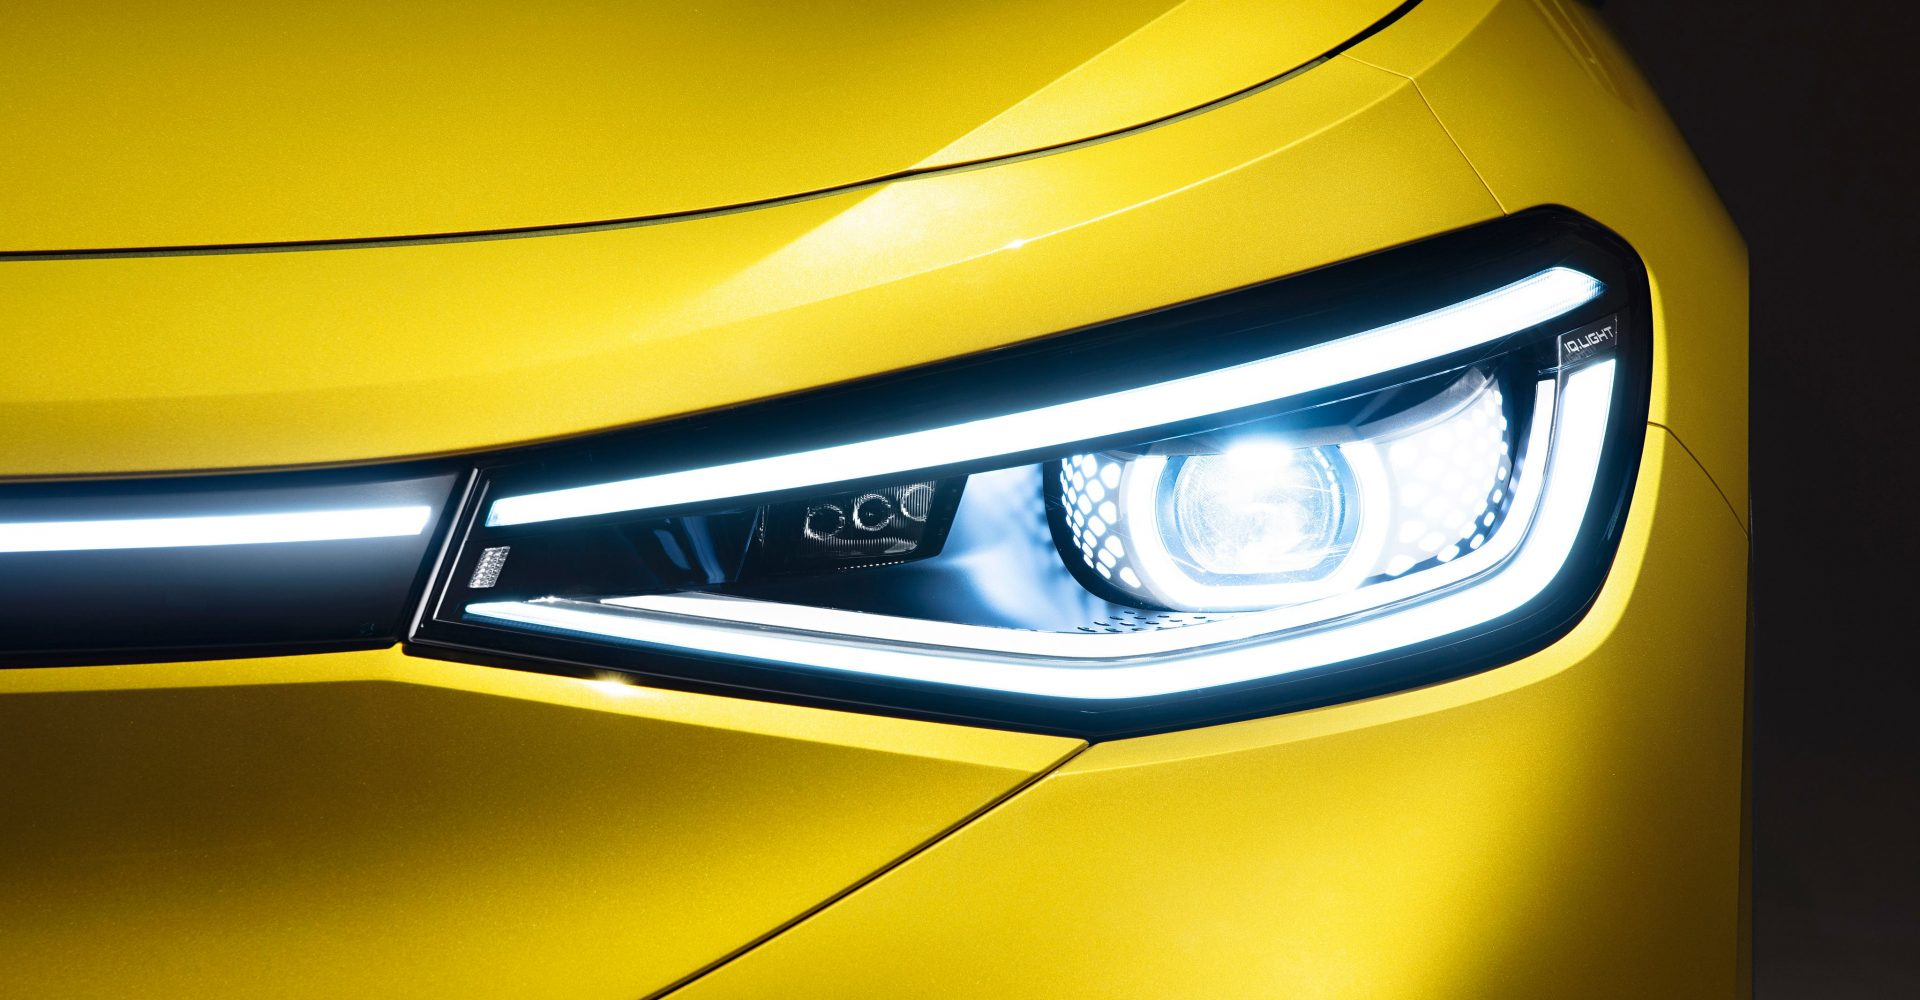 Volkswagen showcases ID.4's lights in new teaser